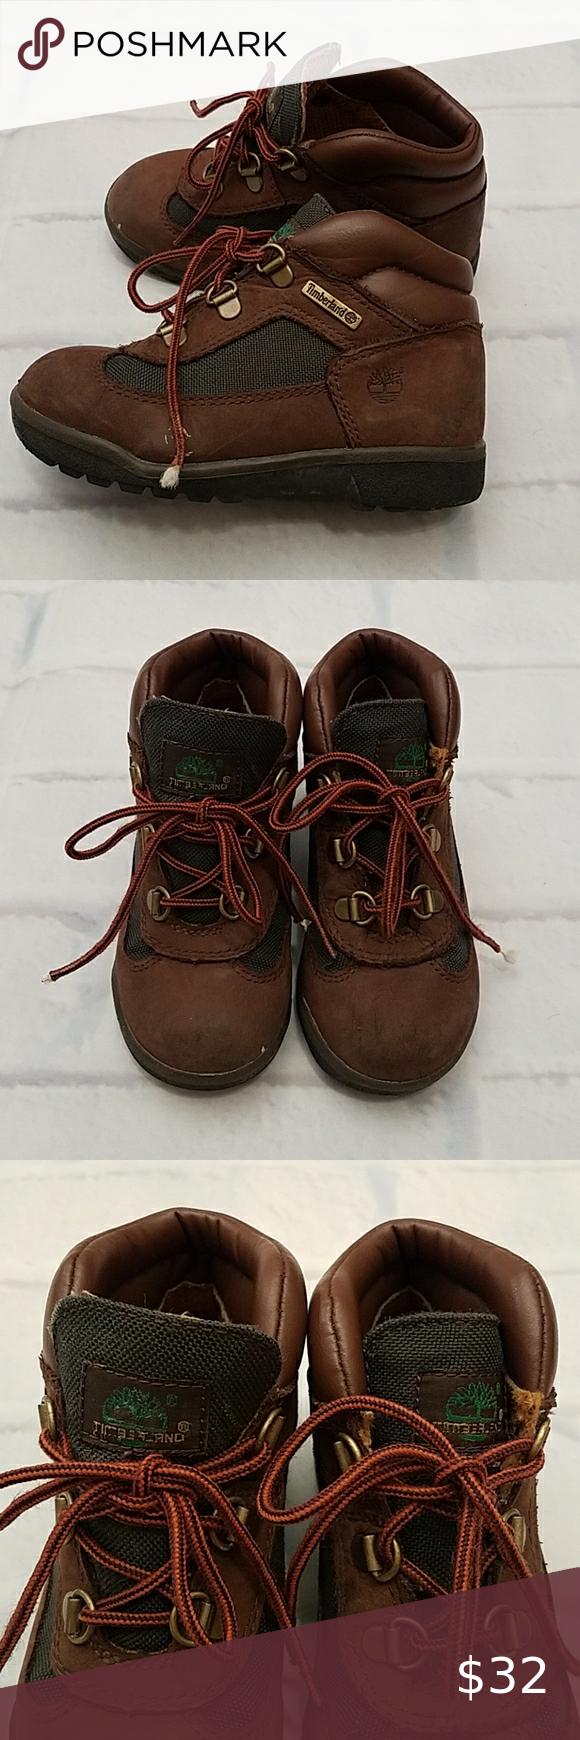 Little Boy's Timberland Hiking Boots